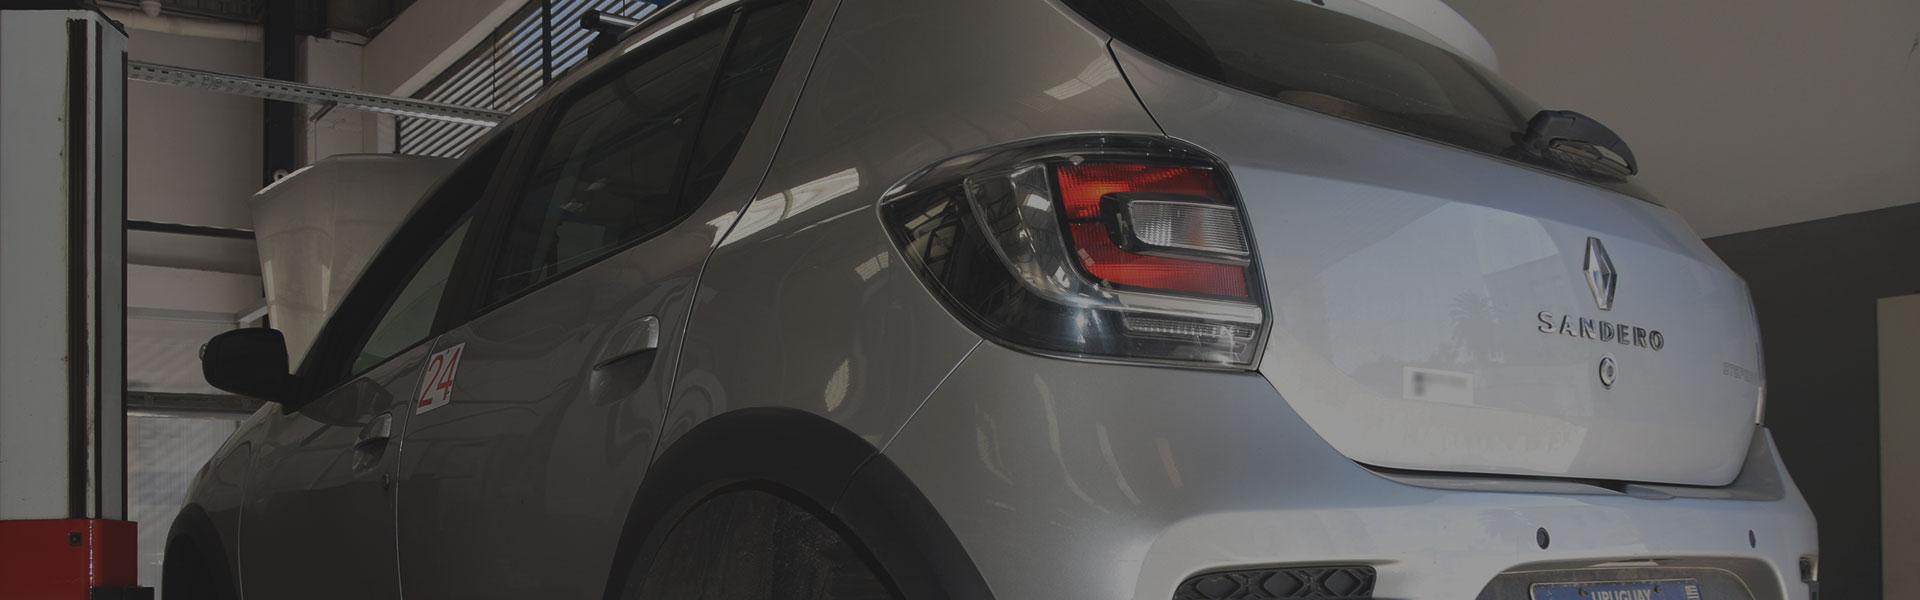 Imagen Slider Auto Renault Sandero